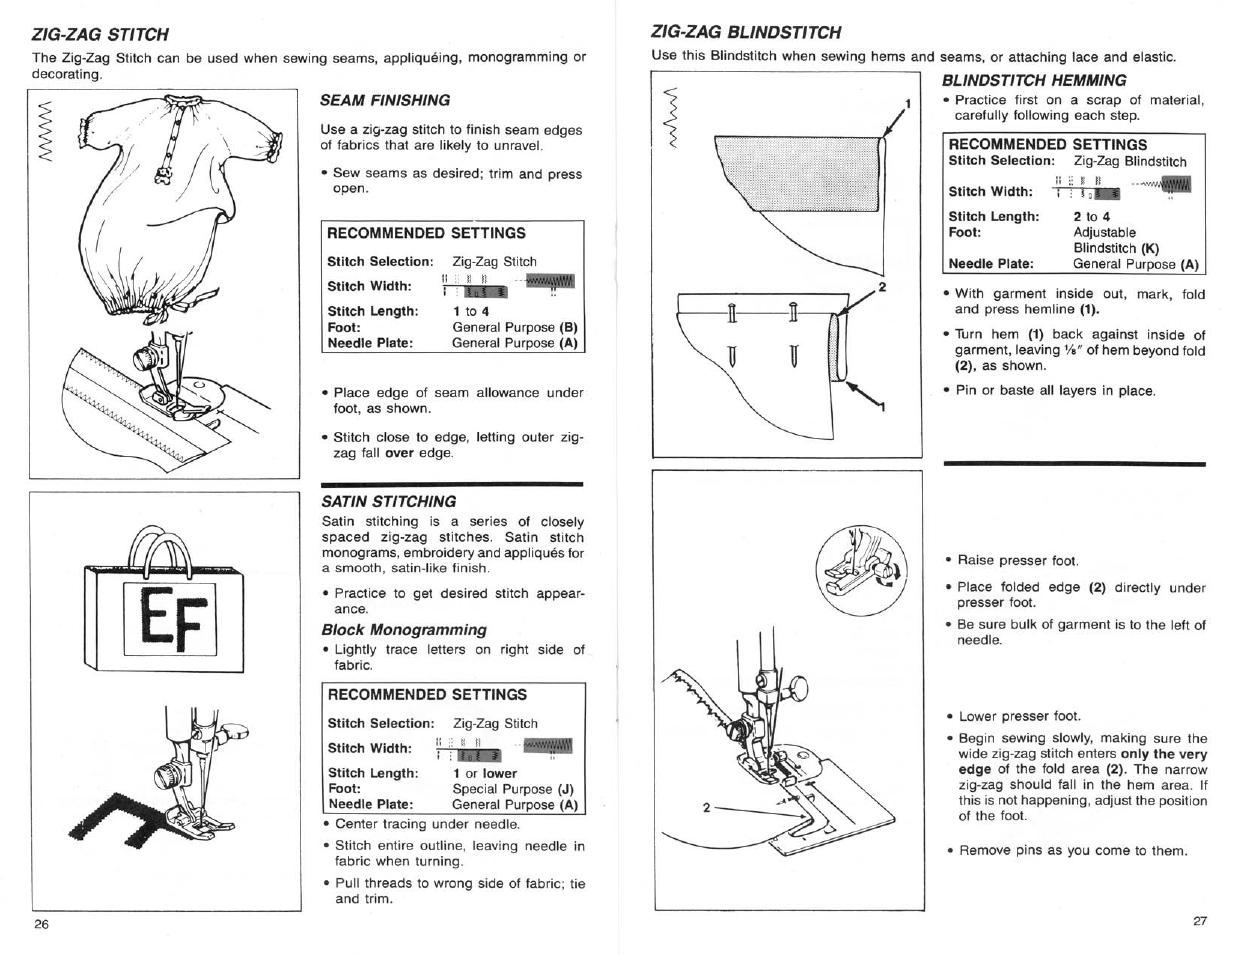 Zig-zag stitch, Seam finishing, Satin stitching | SINGER 9124 User Manual |  Page 15 / 25